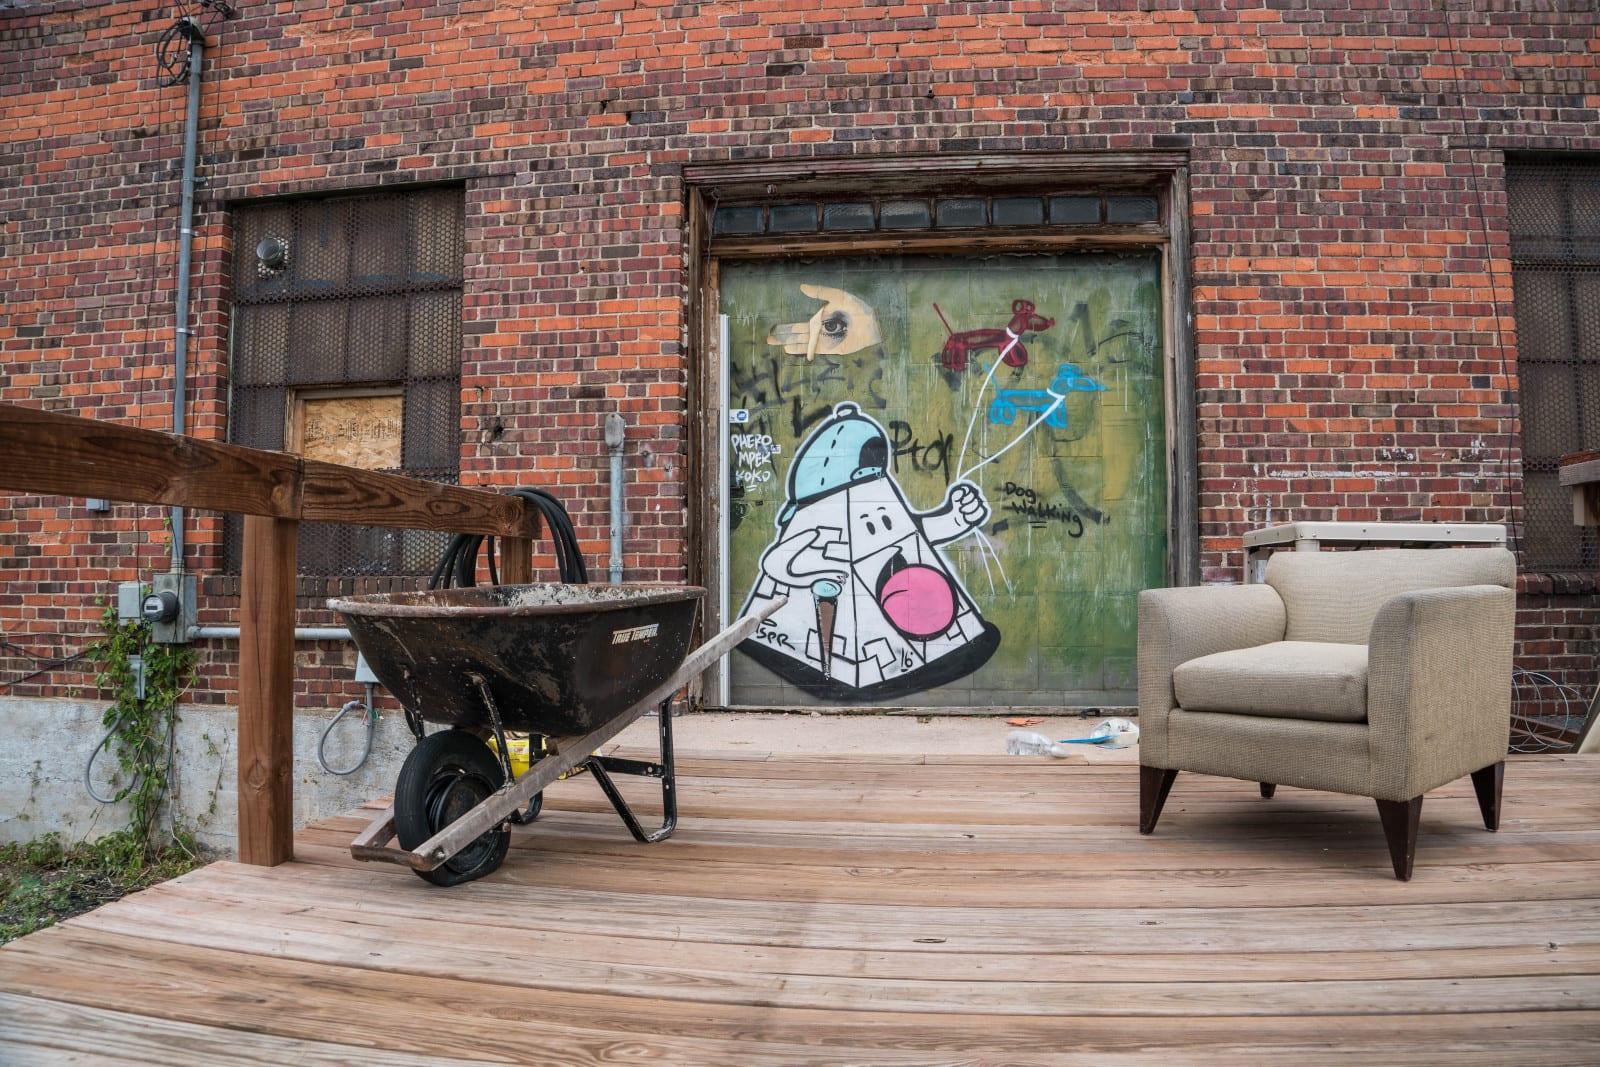 Unique Experiences Denver RiNo Art District Street Graffiti